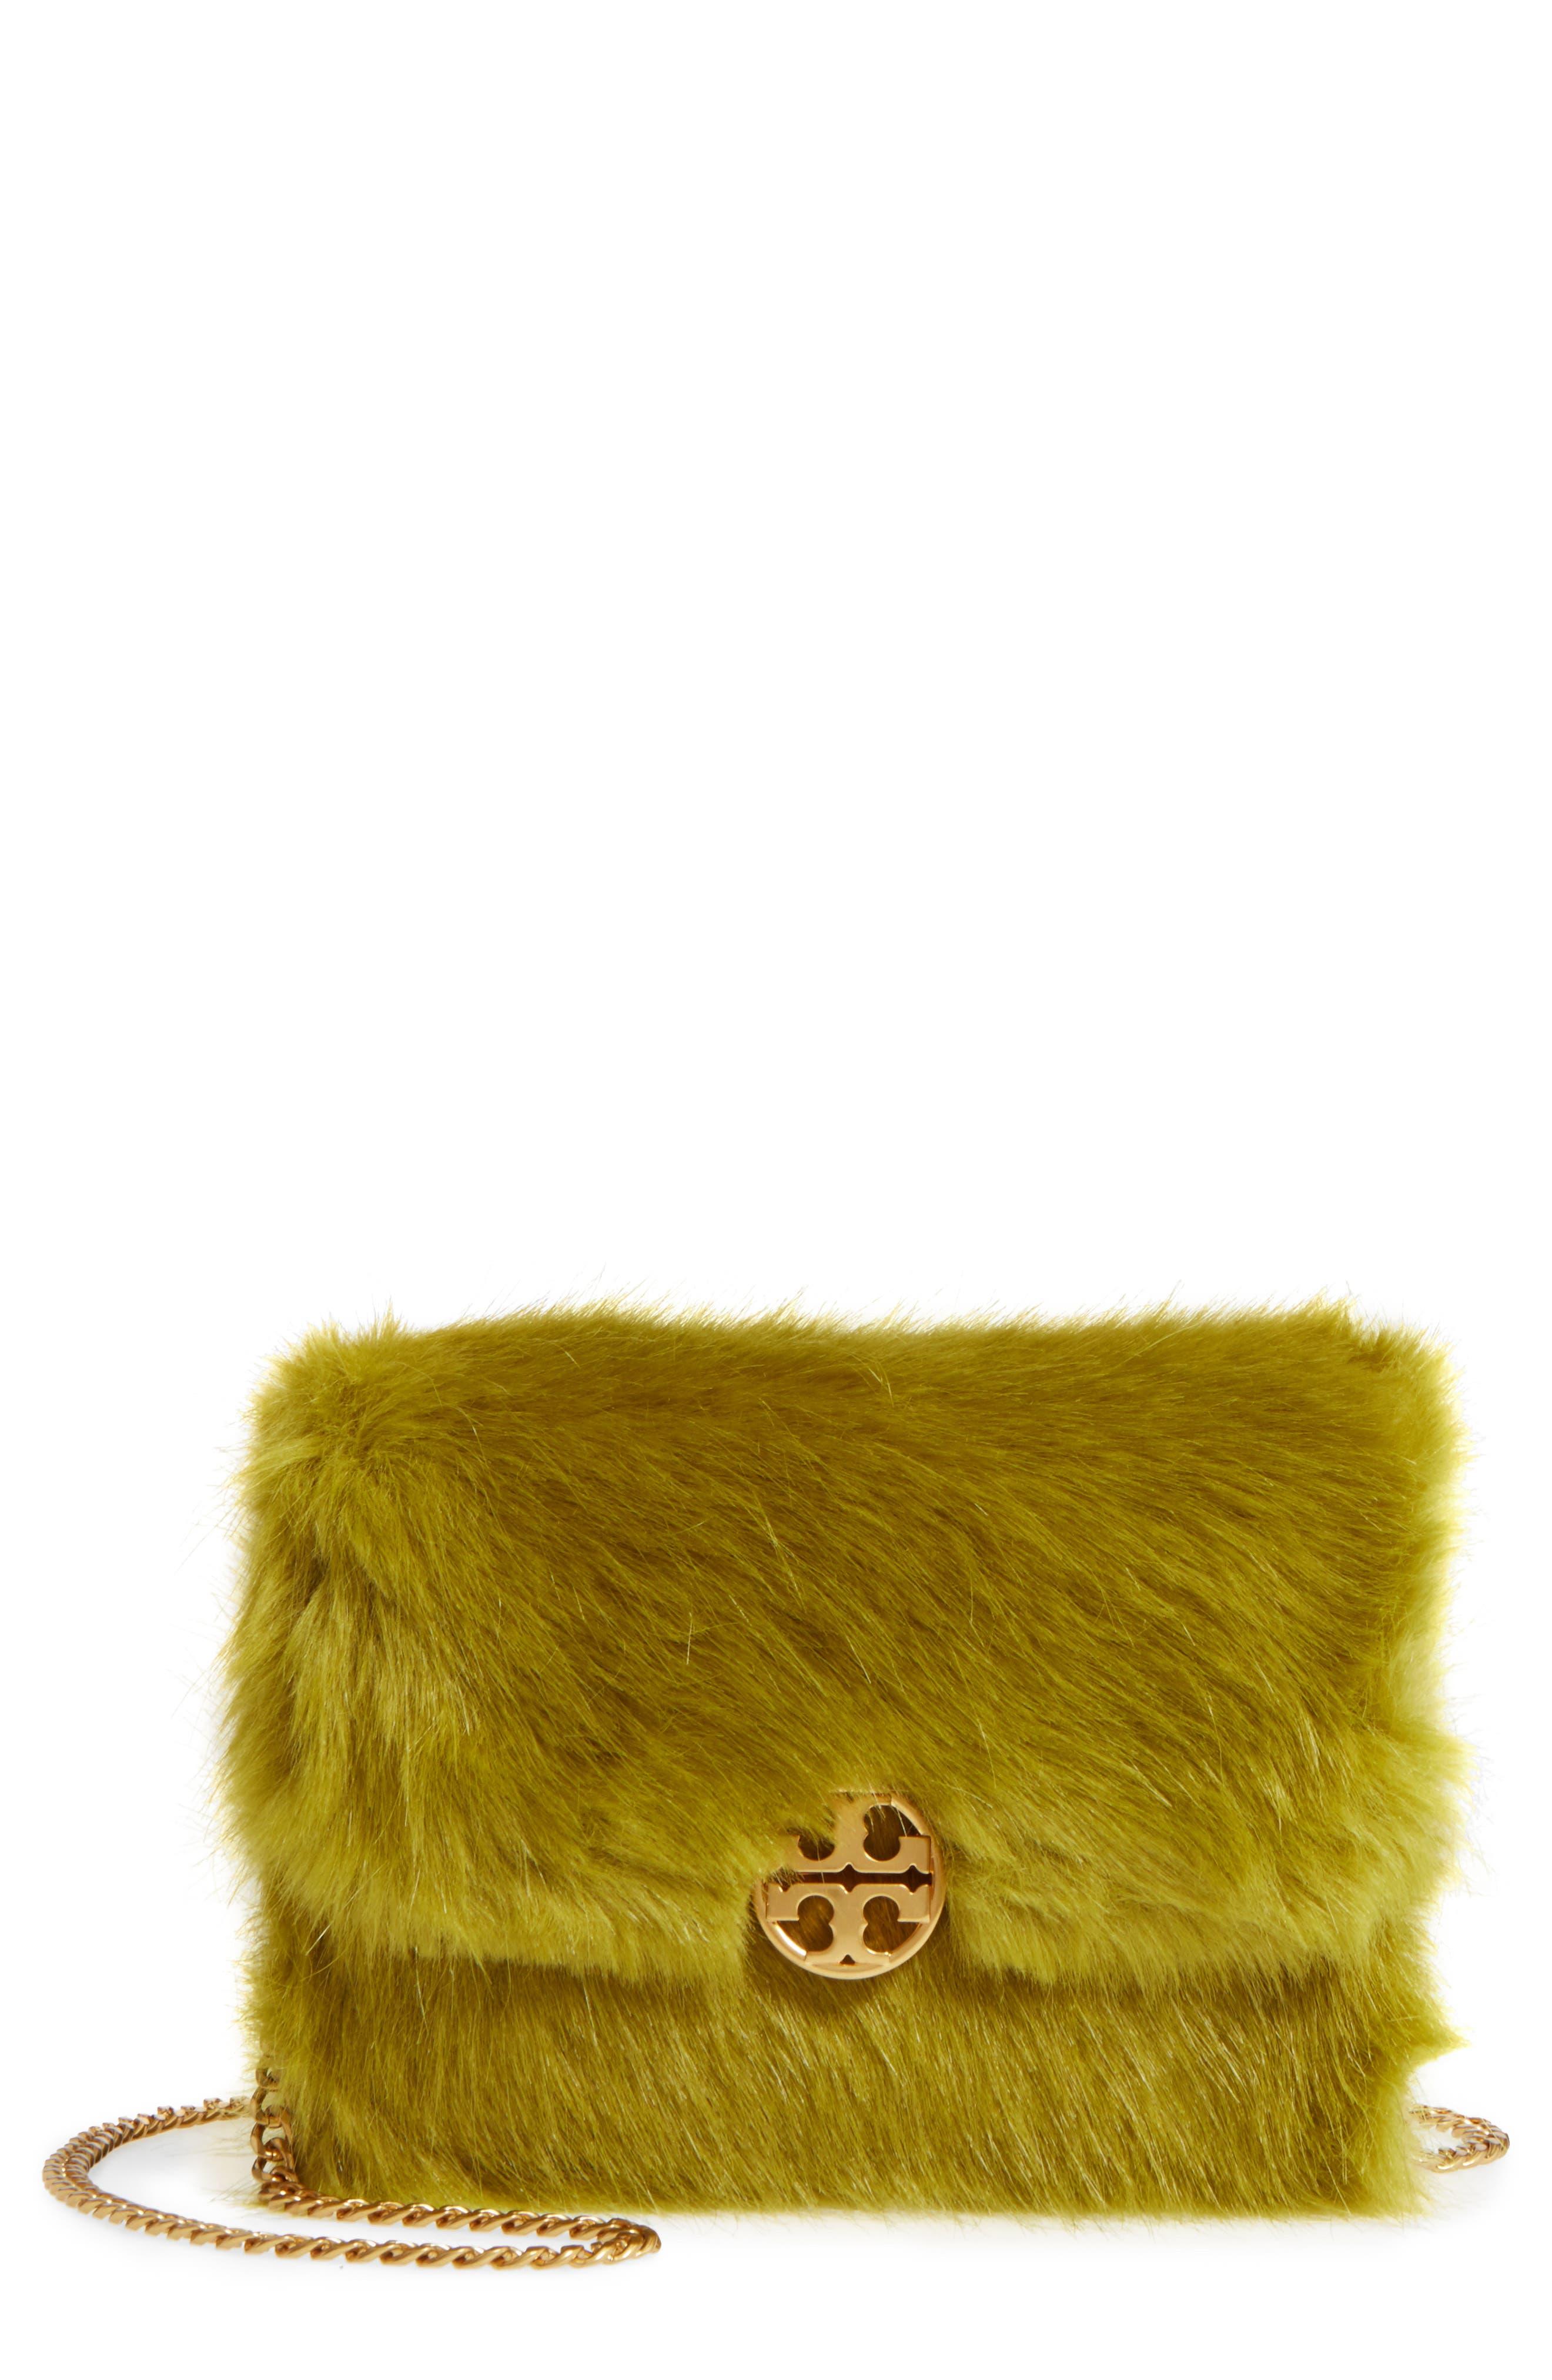 Alternate Image 1 Selected - Tory Burch Mini Chelsea Faux Fur Convertible Crossbody Bag